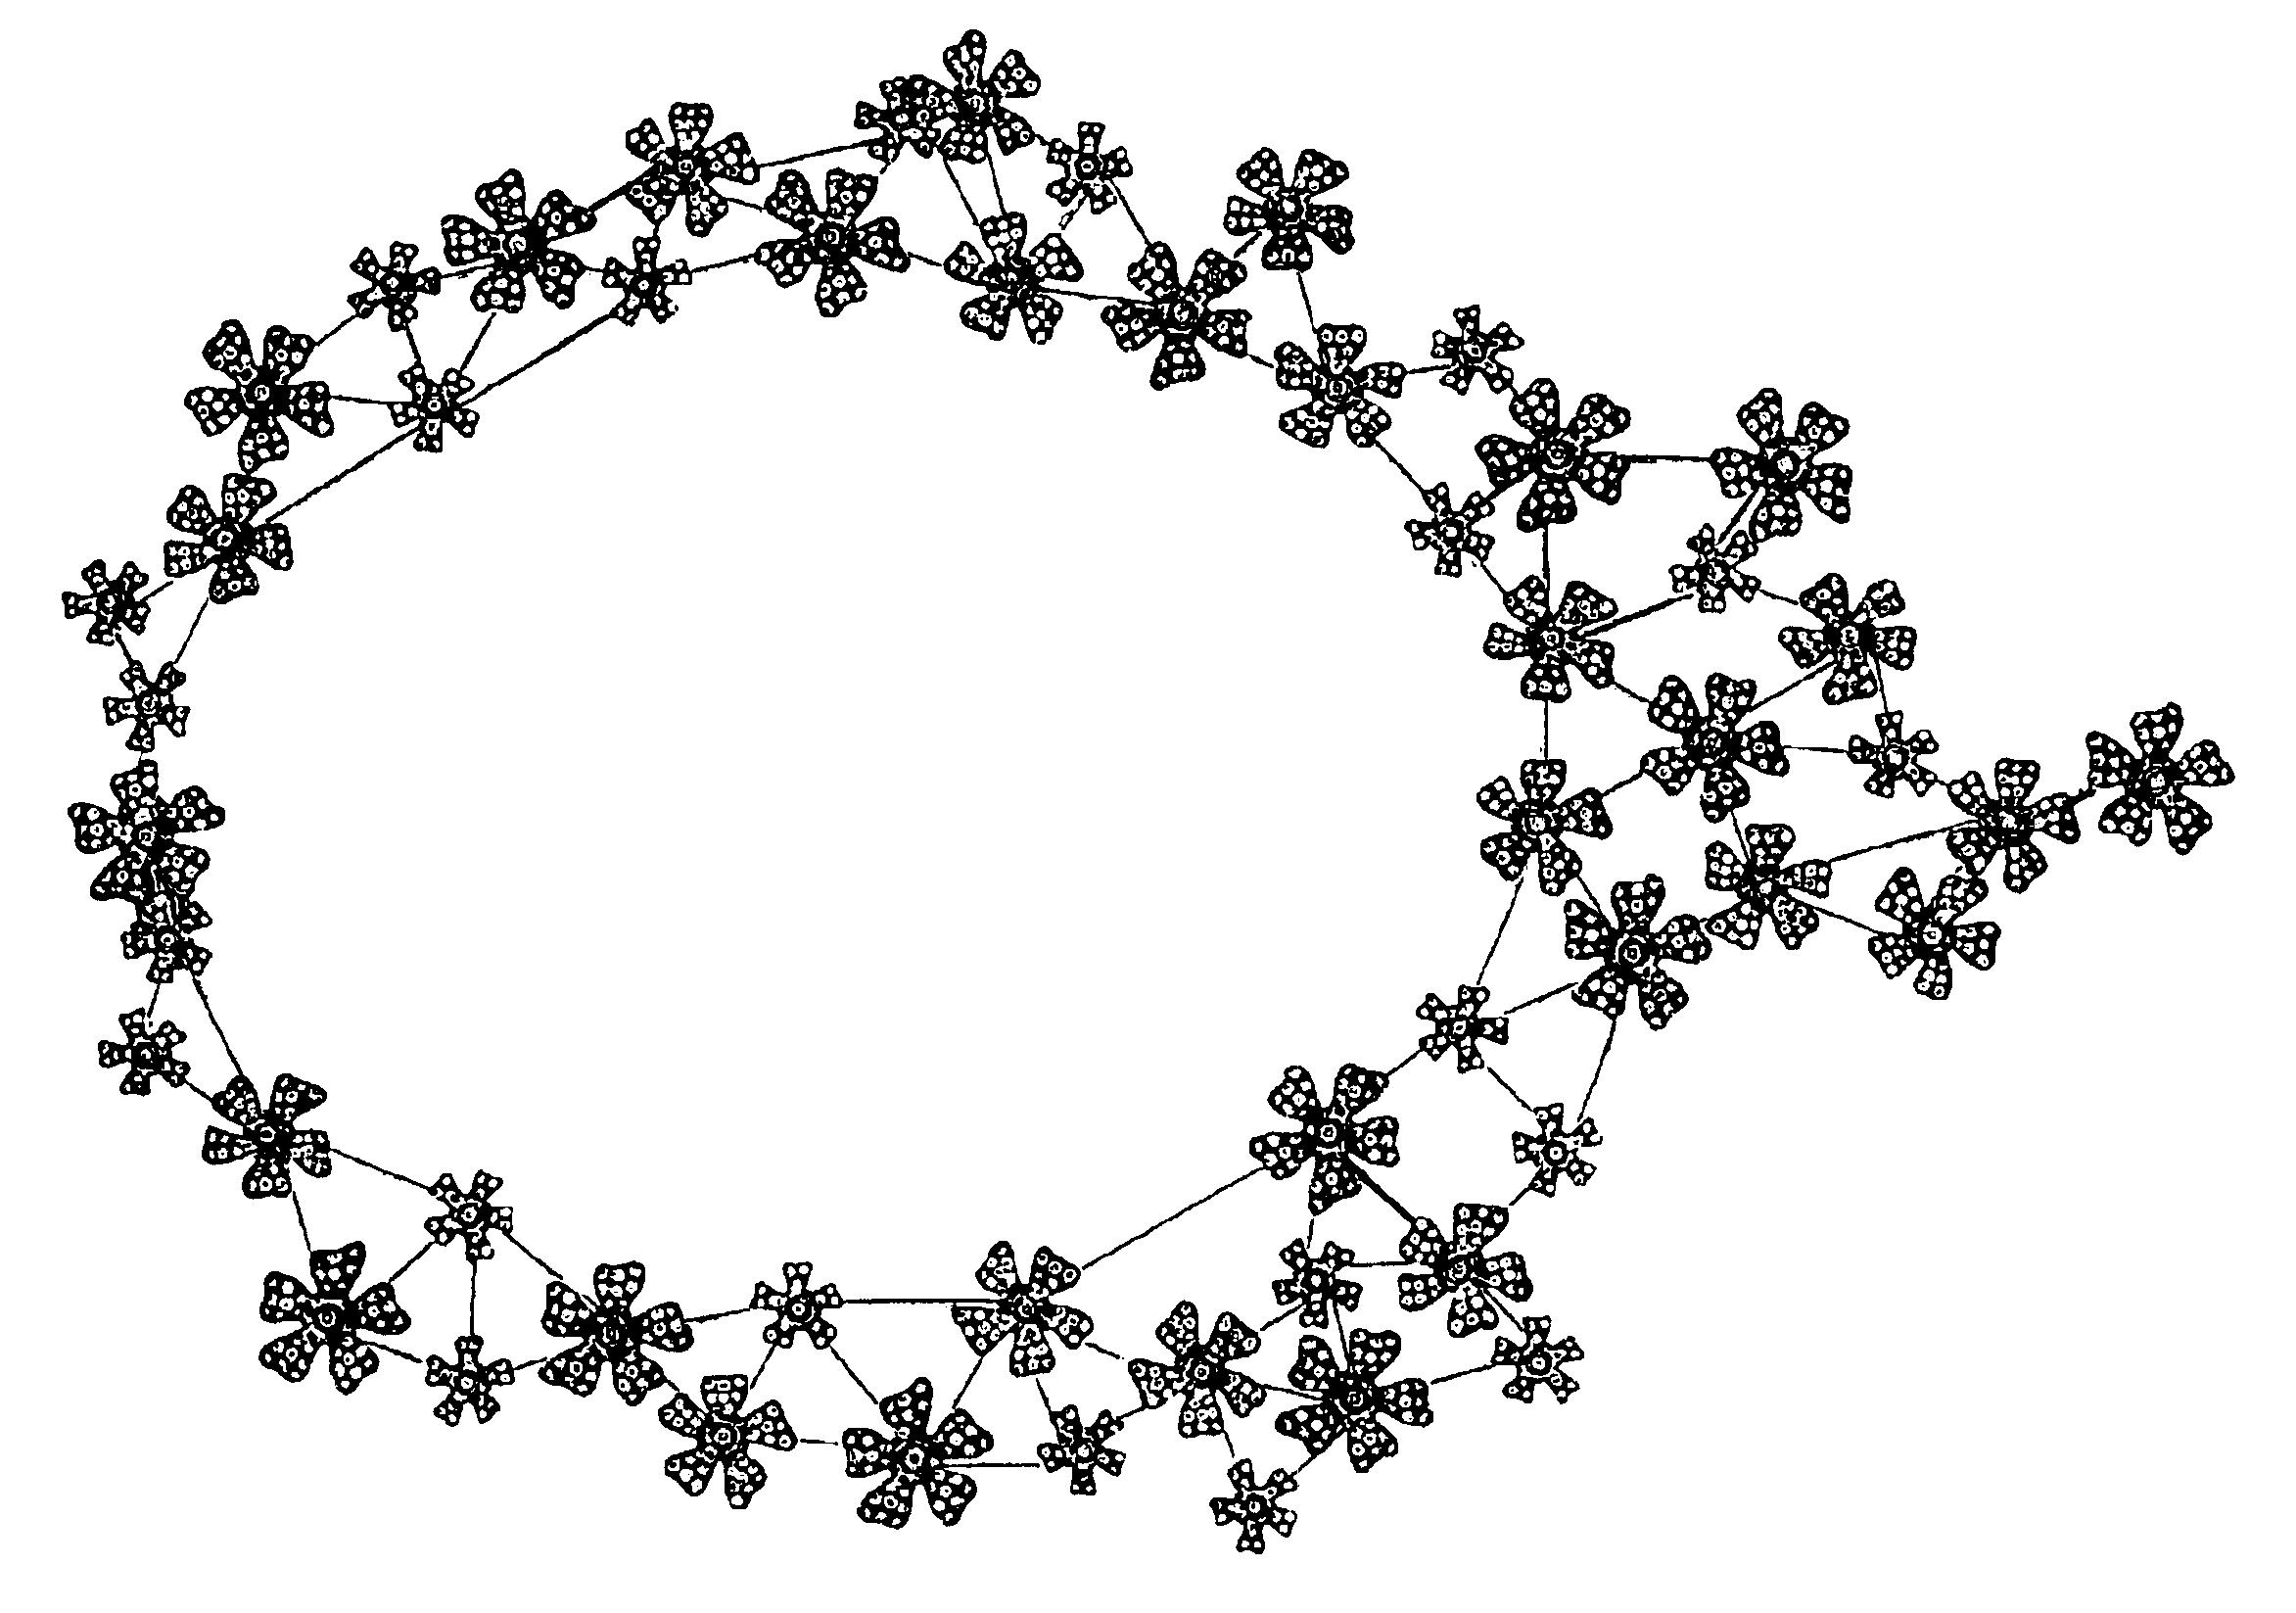 ppt 背景 背景图片 边框 模板 设计 矢量 矢量图 素材 相框 2345_1647